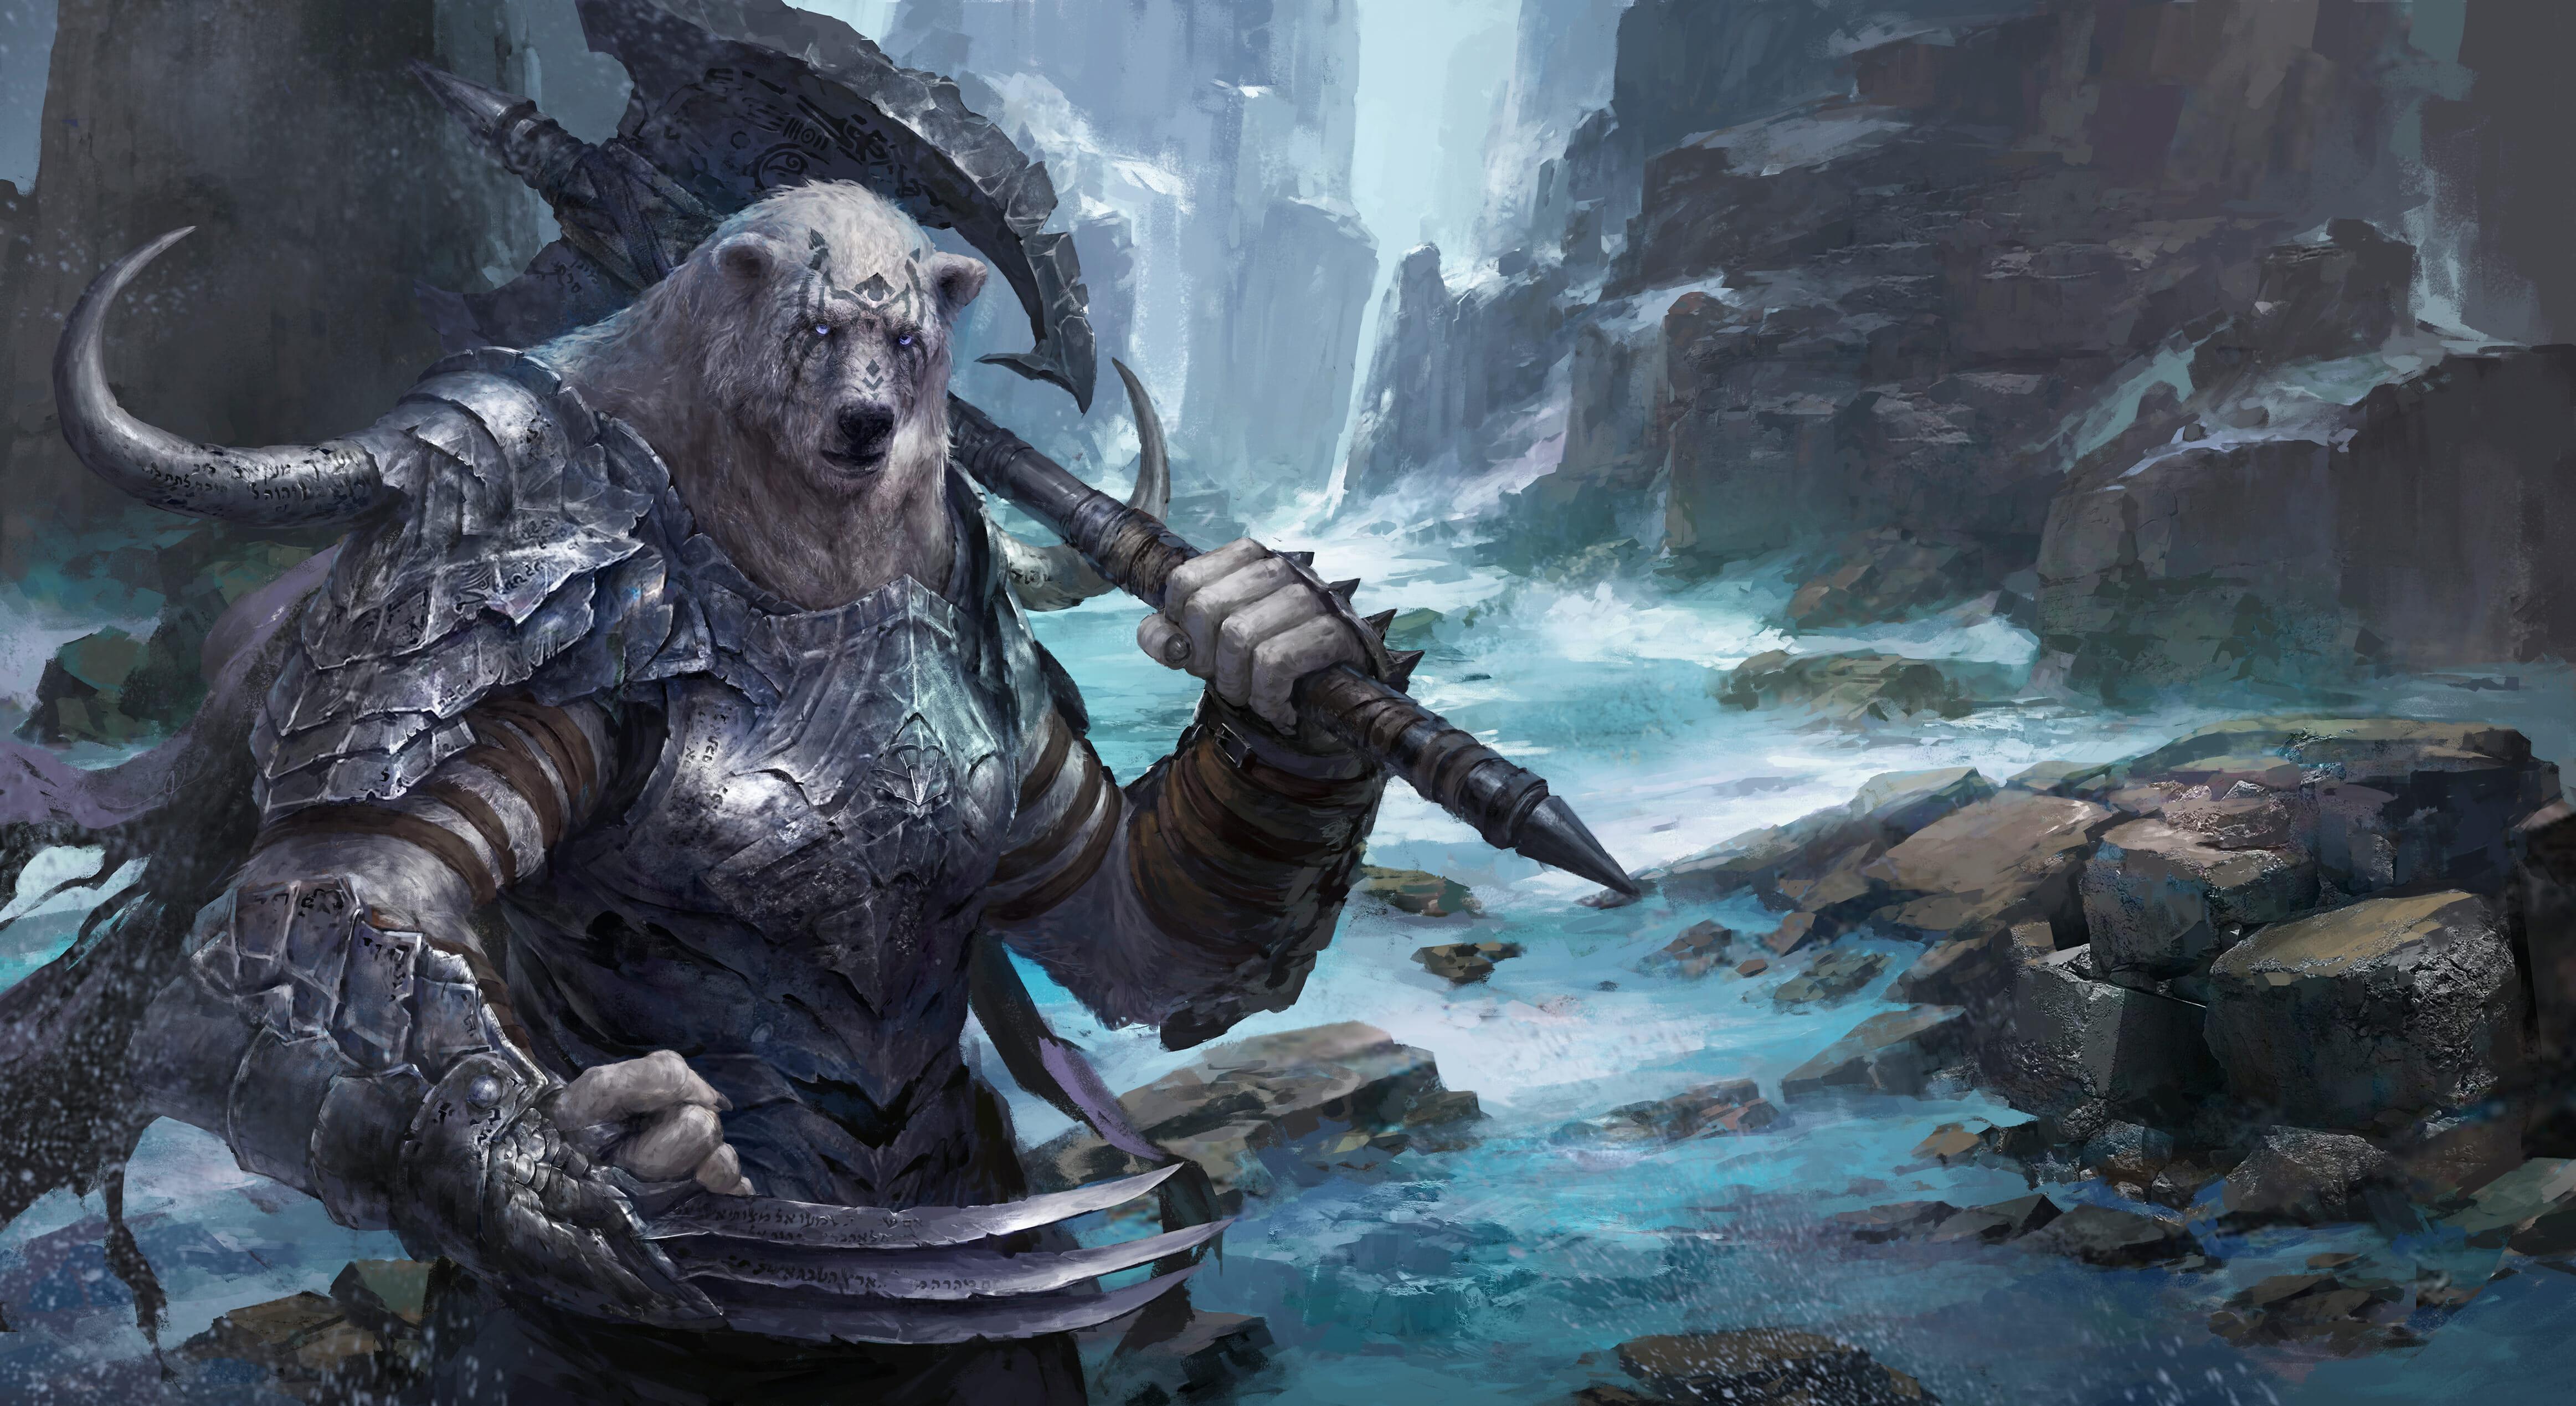 Ursus Oathsworn